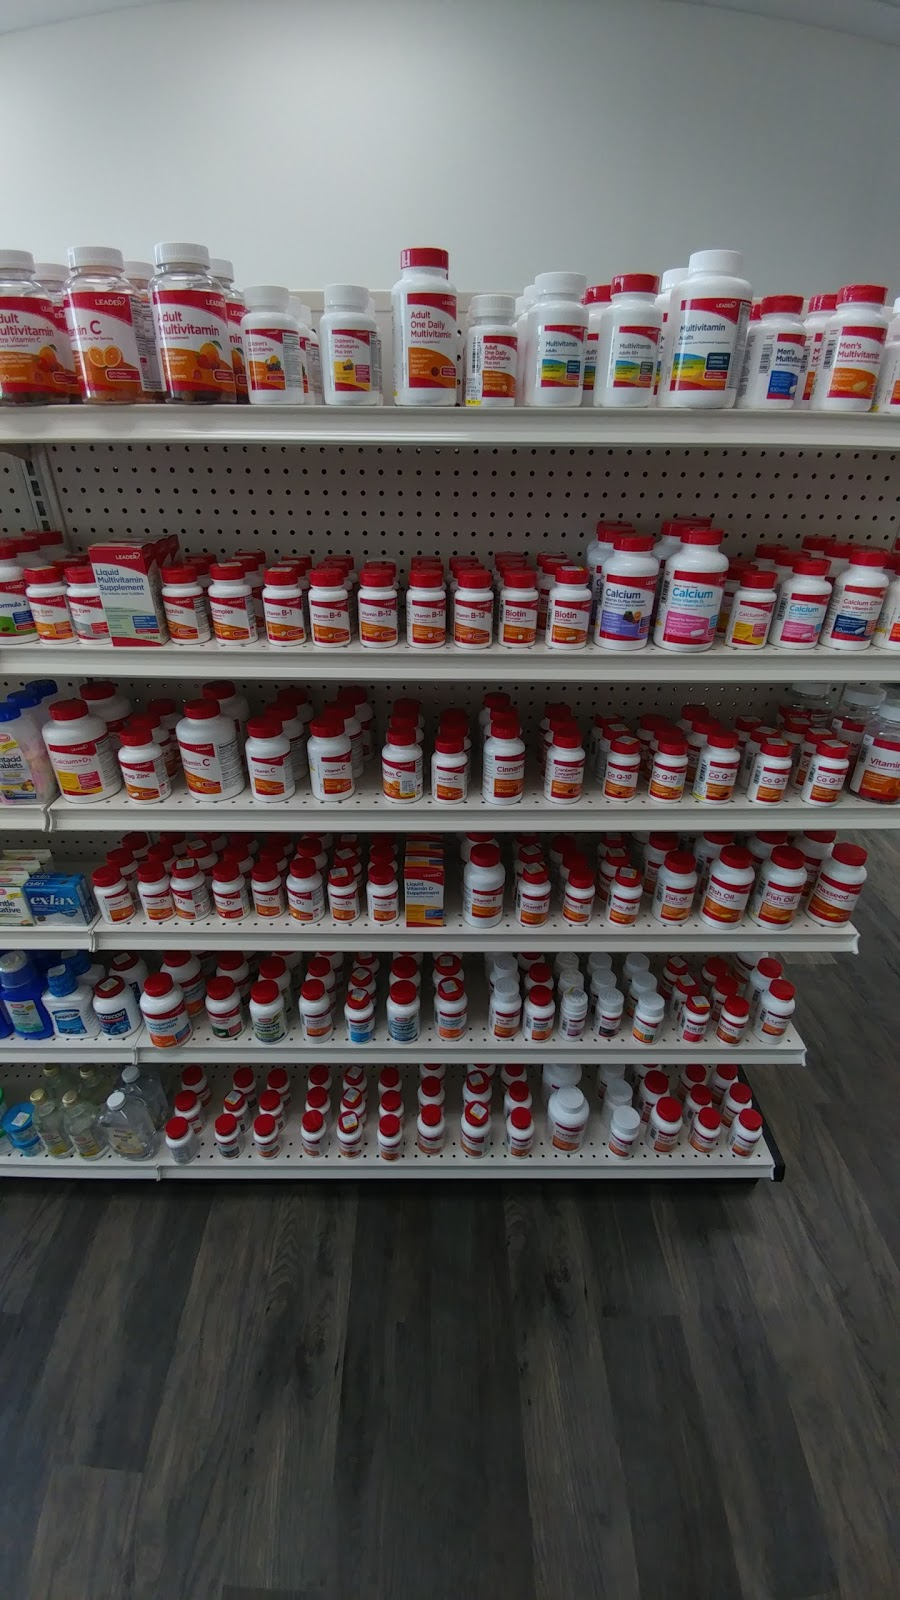 Frisco Pharmacy - pharmacy  | Photo 8 of 10 | Address: 14550 TX-121 STE 150, Frisco, TX 75035, USA | Phone: (469) 305-7058